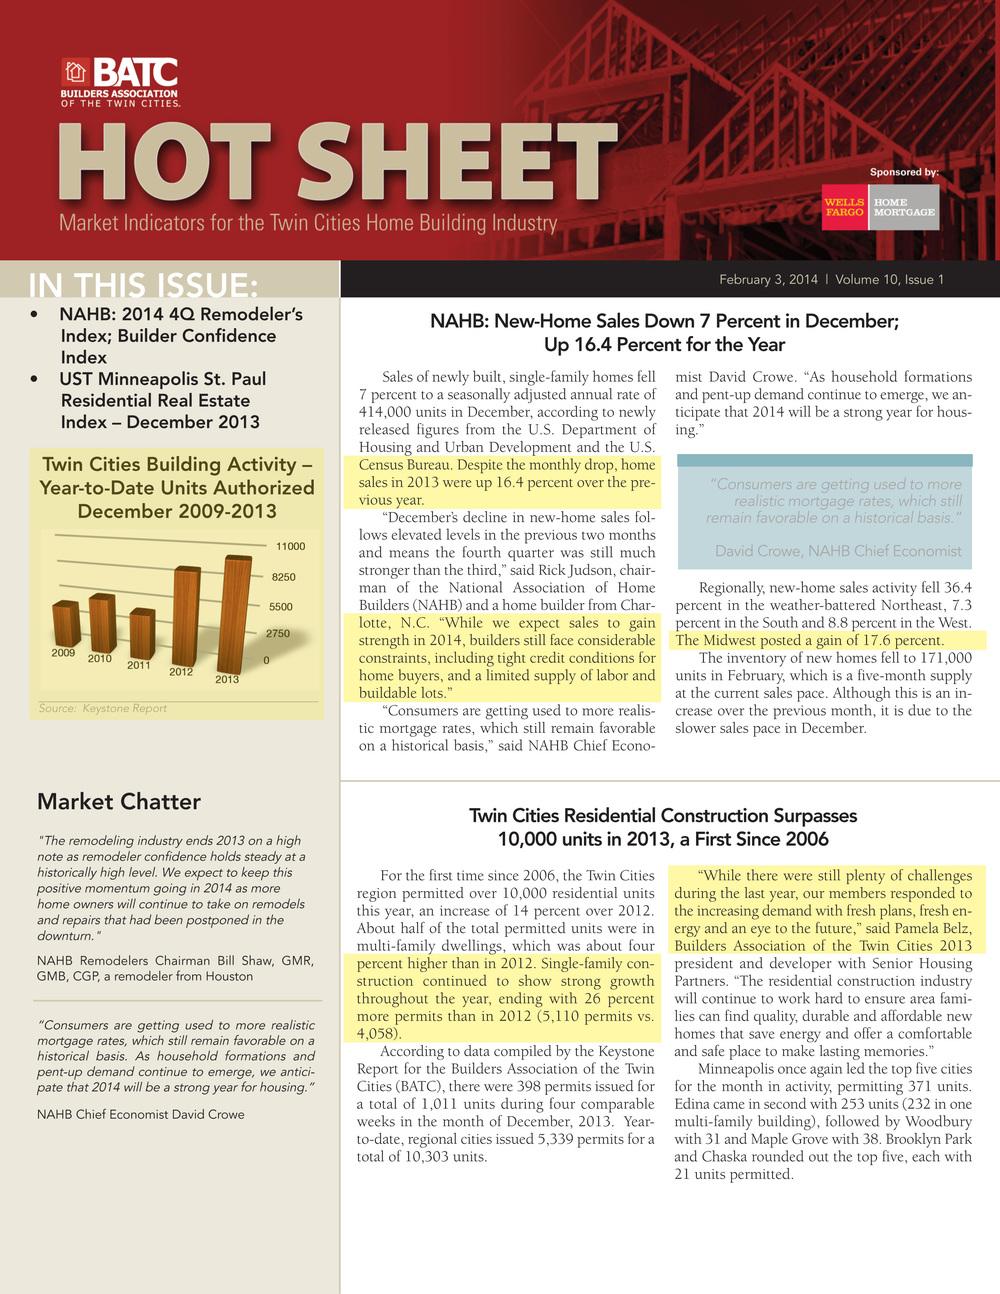 January 2014 Page 1 Hot Sheet.jpg